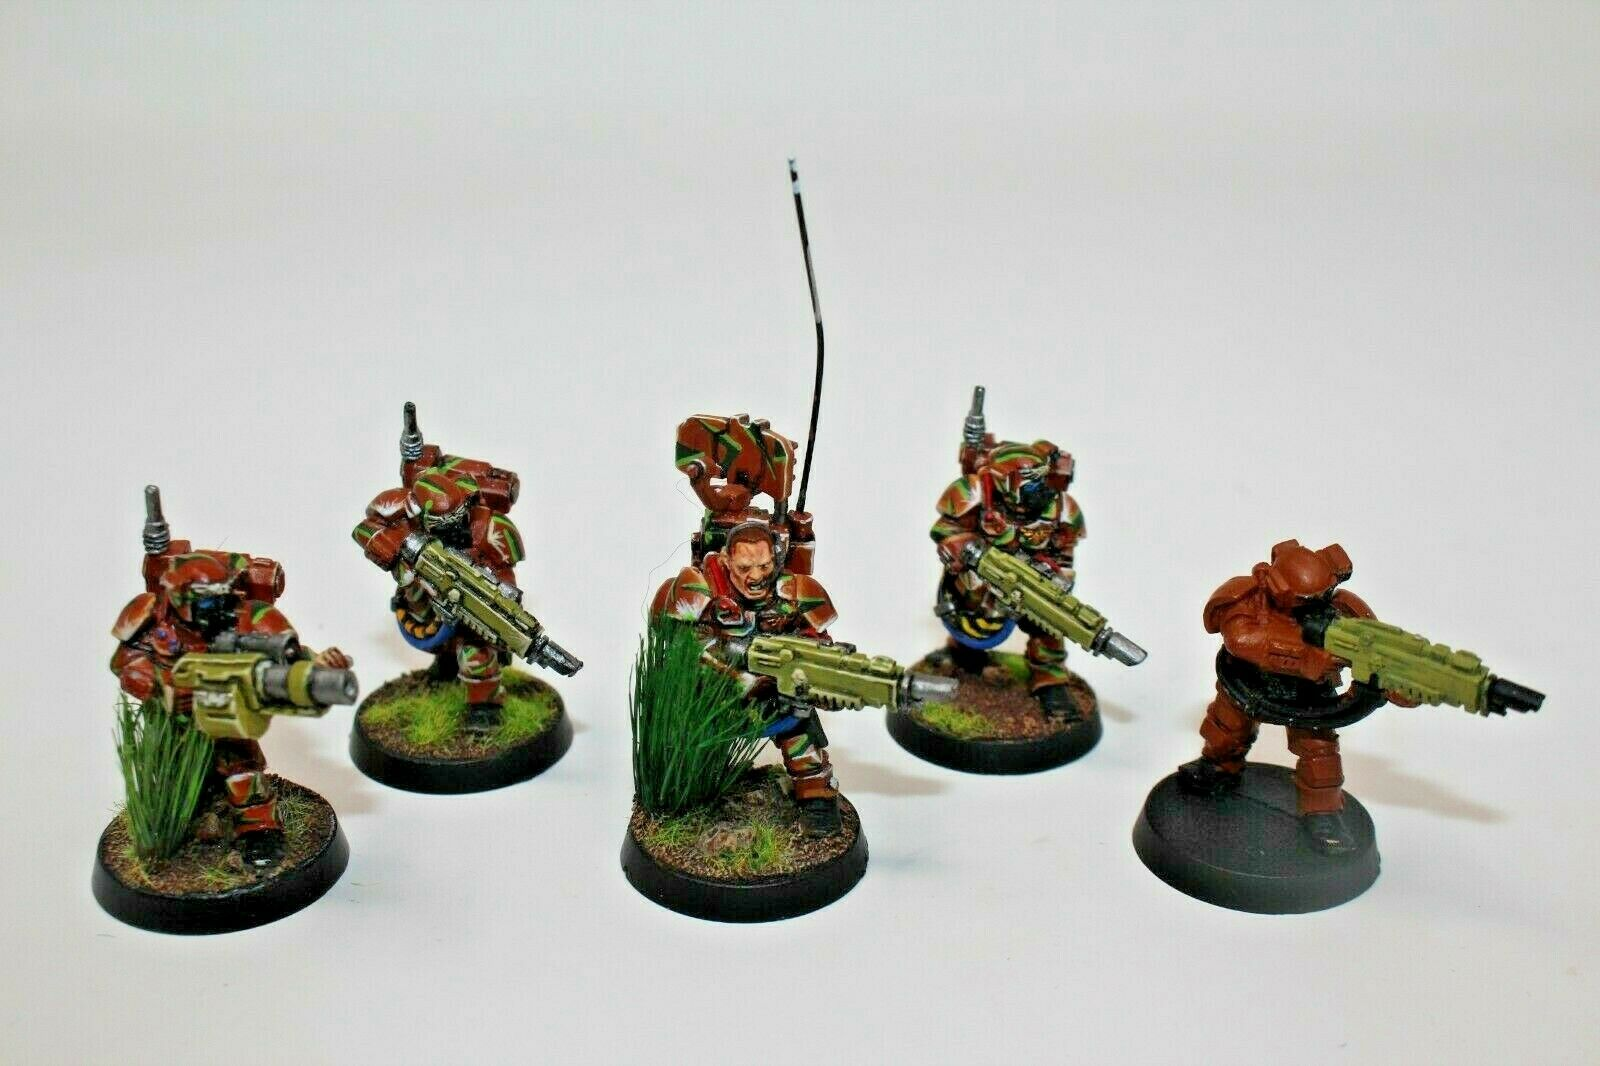 Warhammer Guardia Imperiale Kazerkan Squad Ben verniciato mettuttio - JYs11